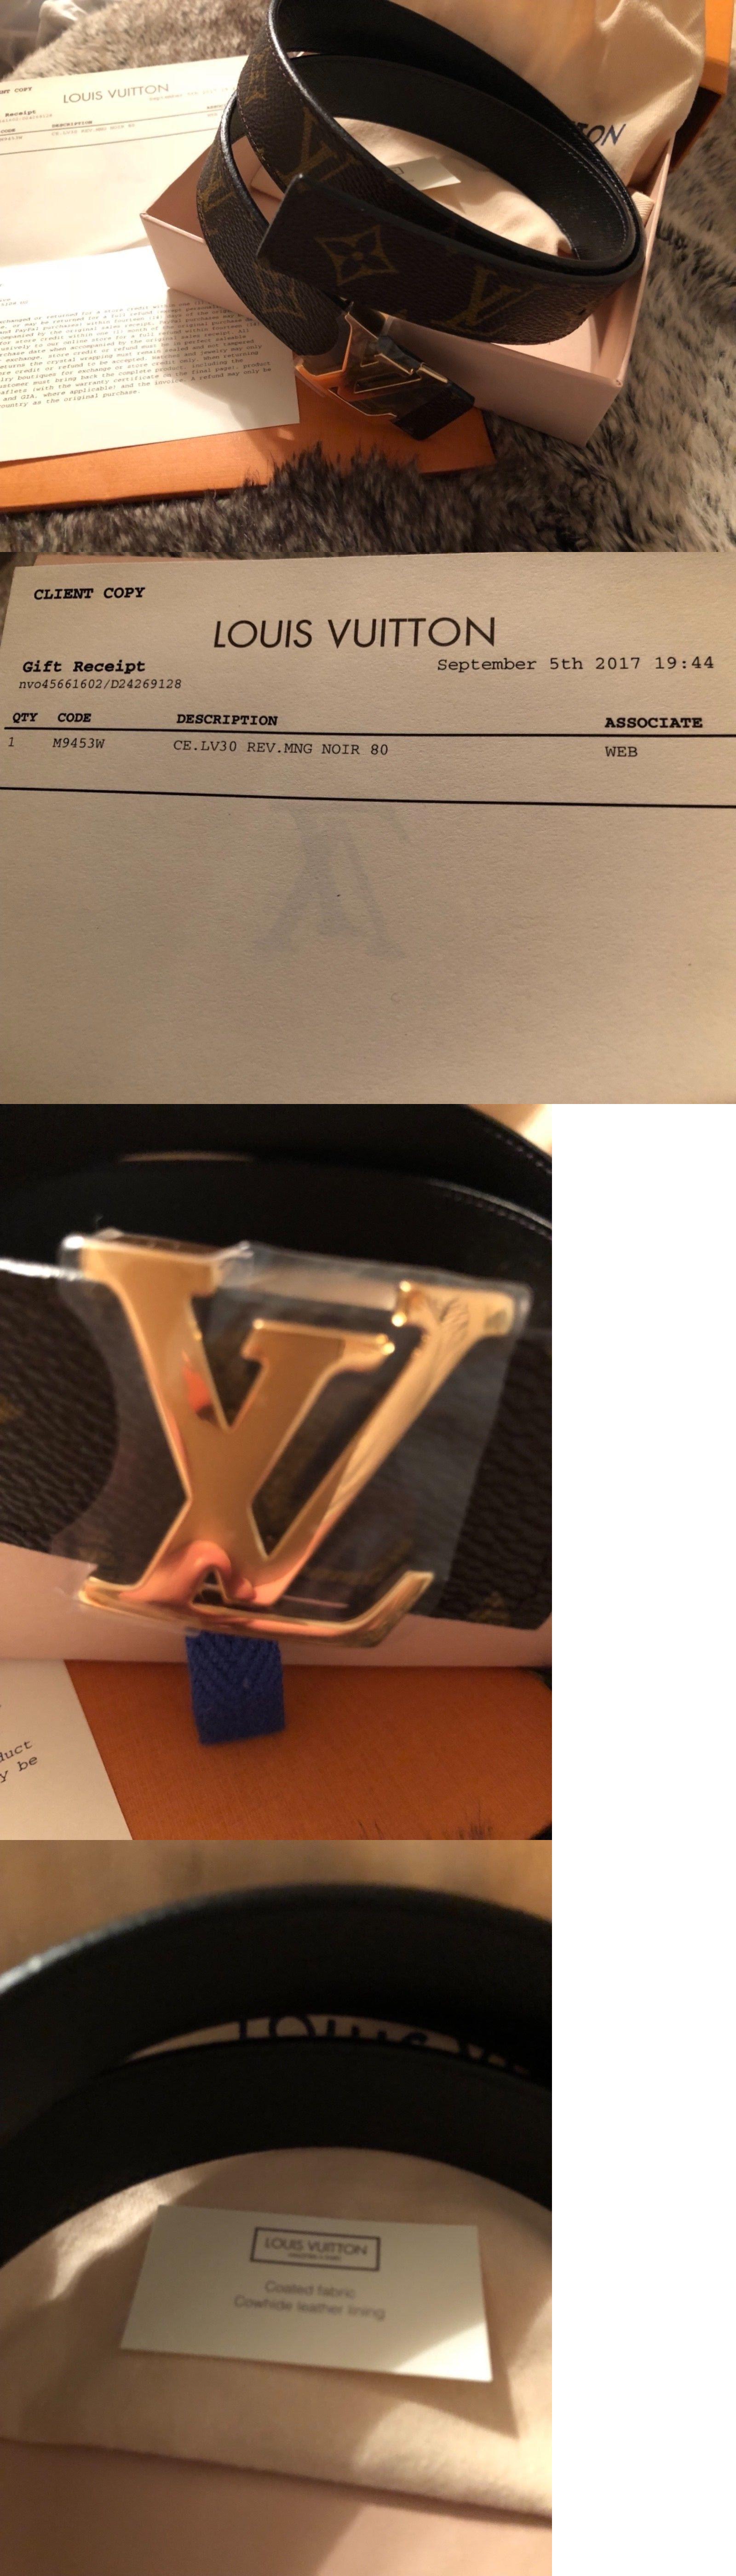 217d86e89291 Belts 2993  Louis Vuitton Lv Initiales 30Mm Reversible M9453w -  BUY IT NOW  ONLY   510 on eBay!